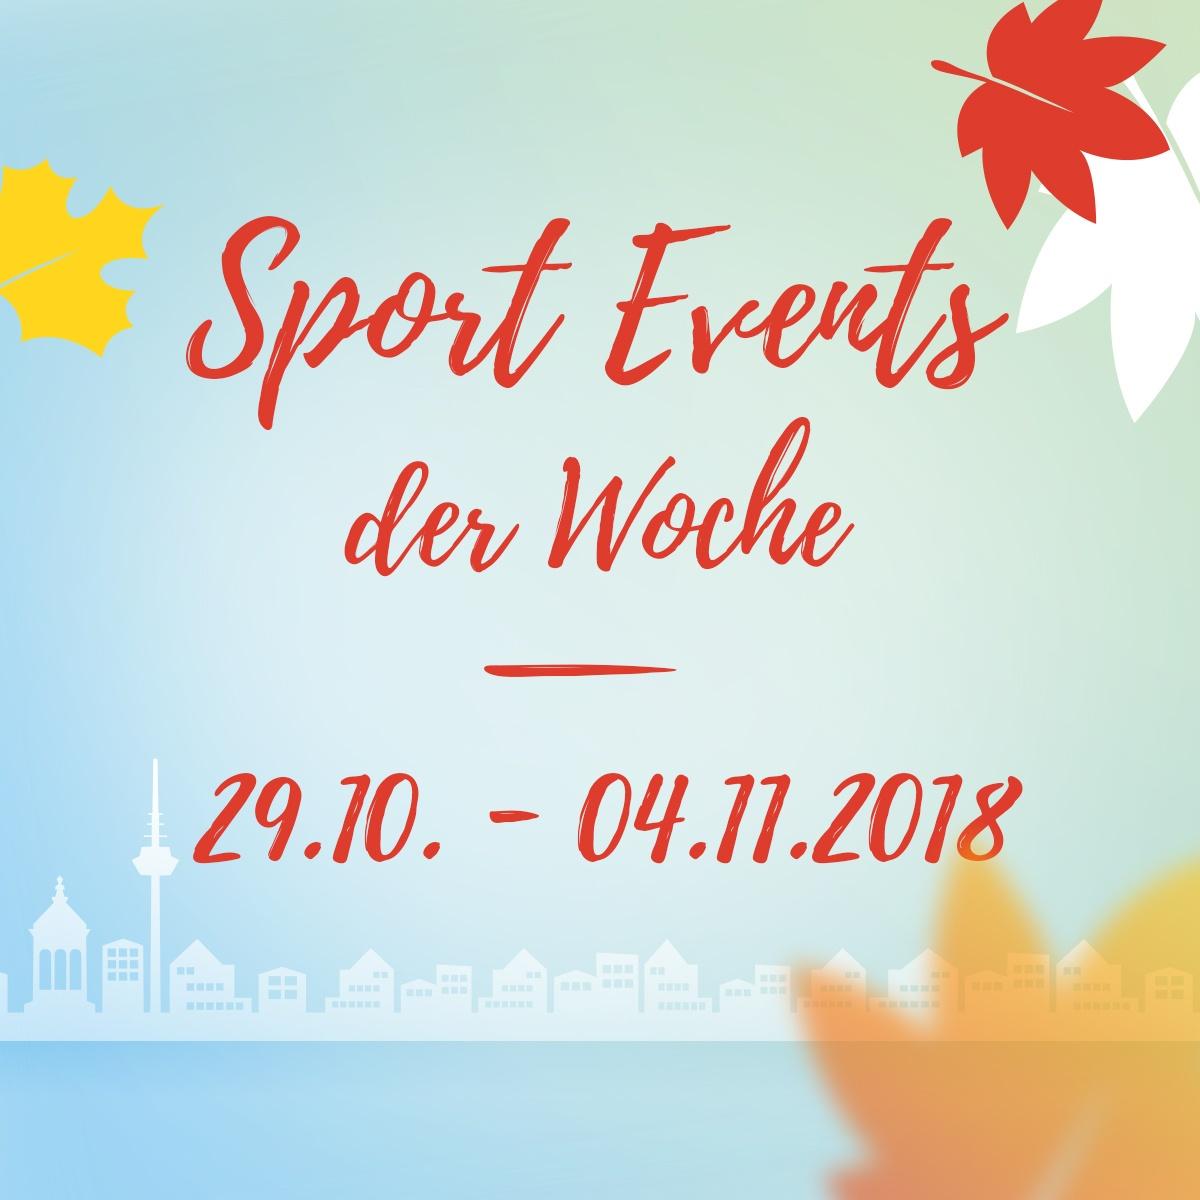 engelhorn sports Events der Woche